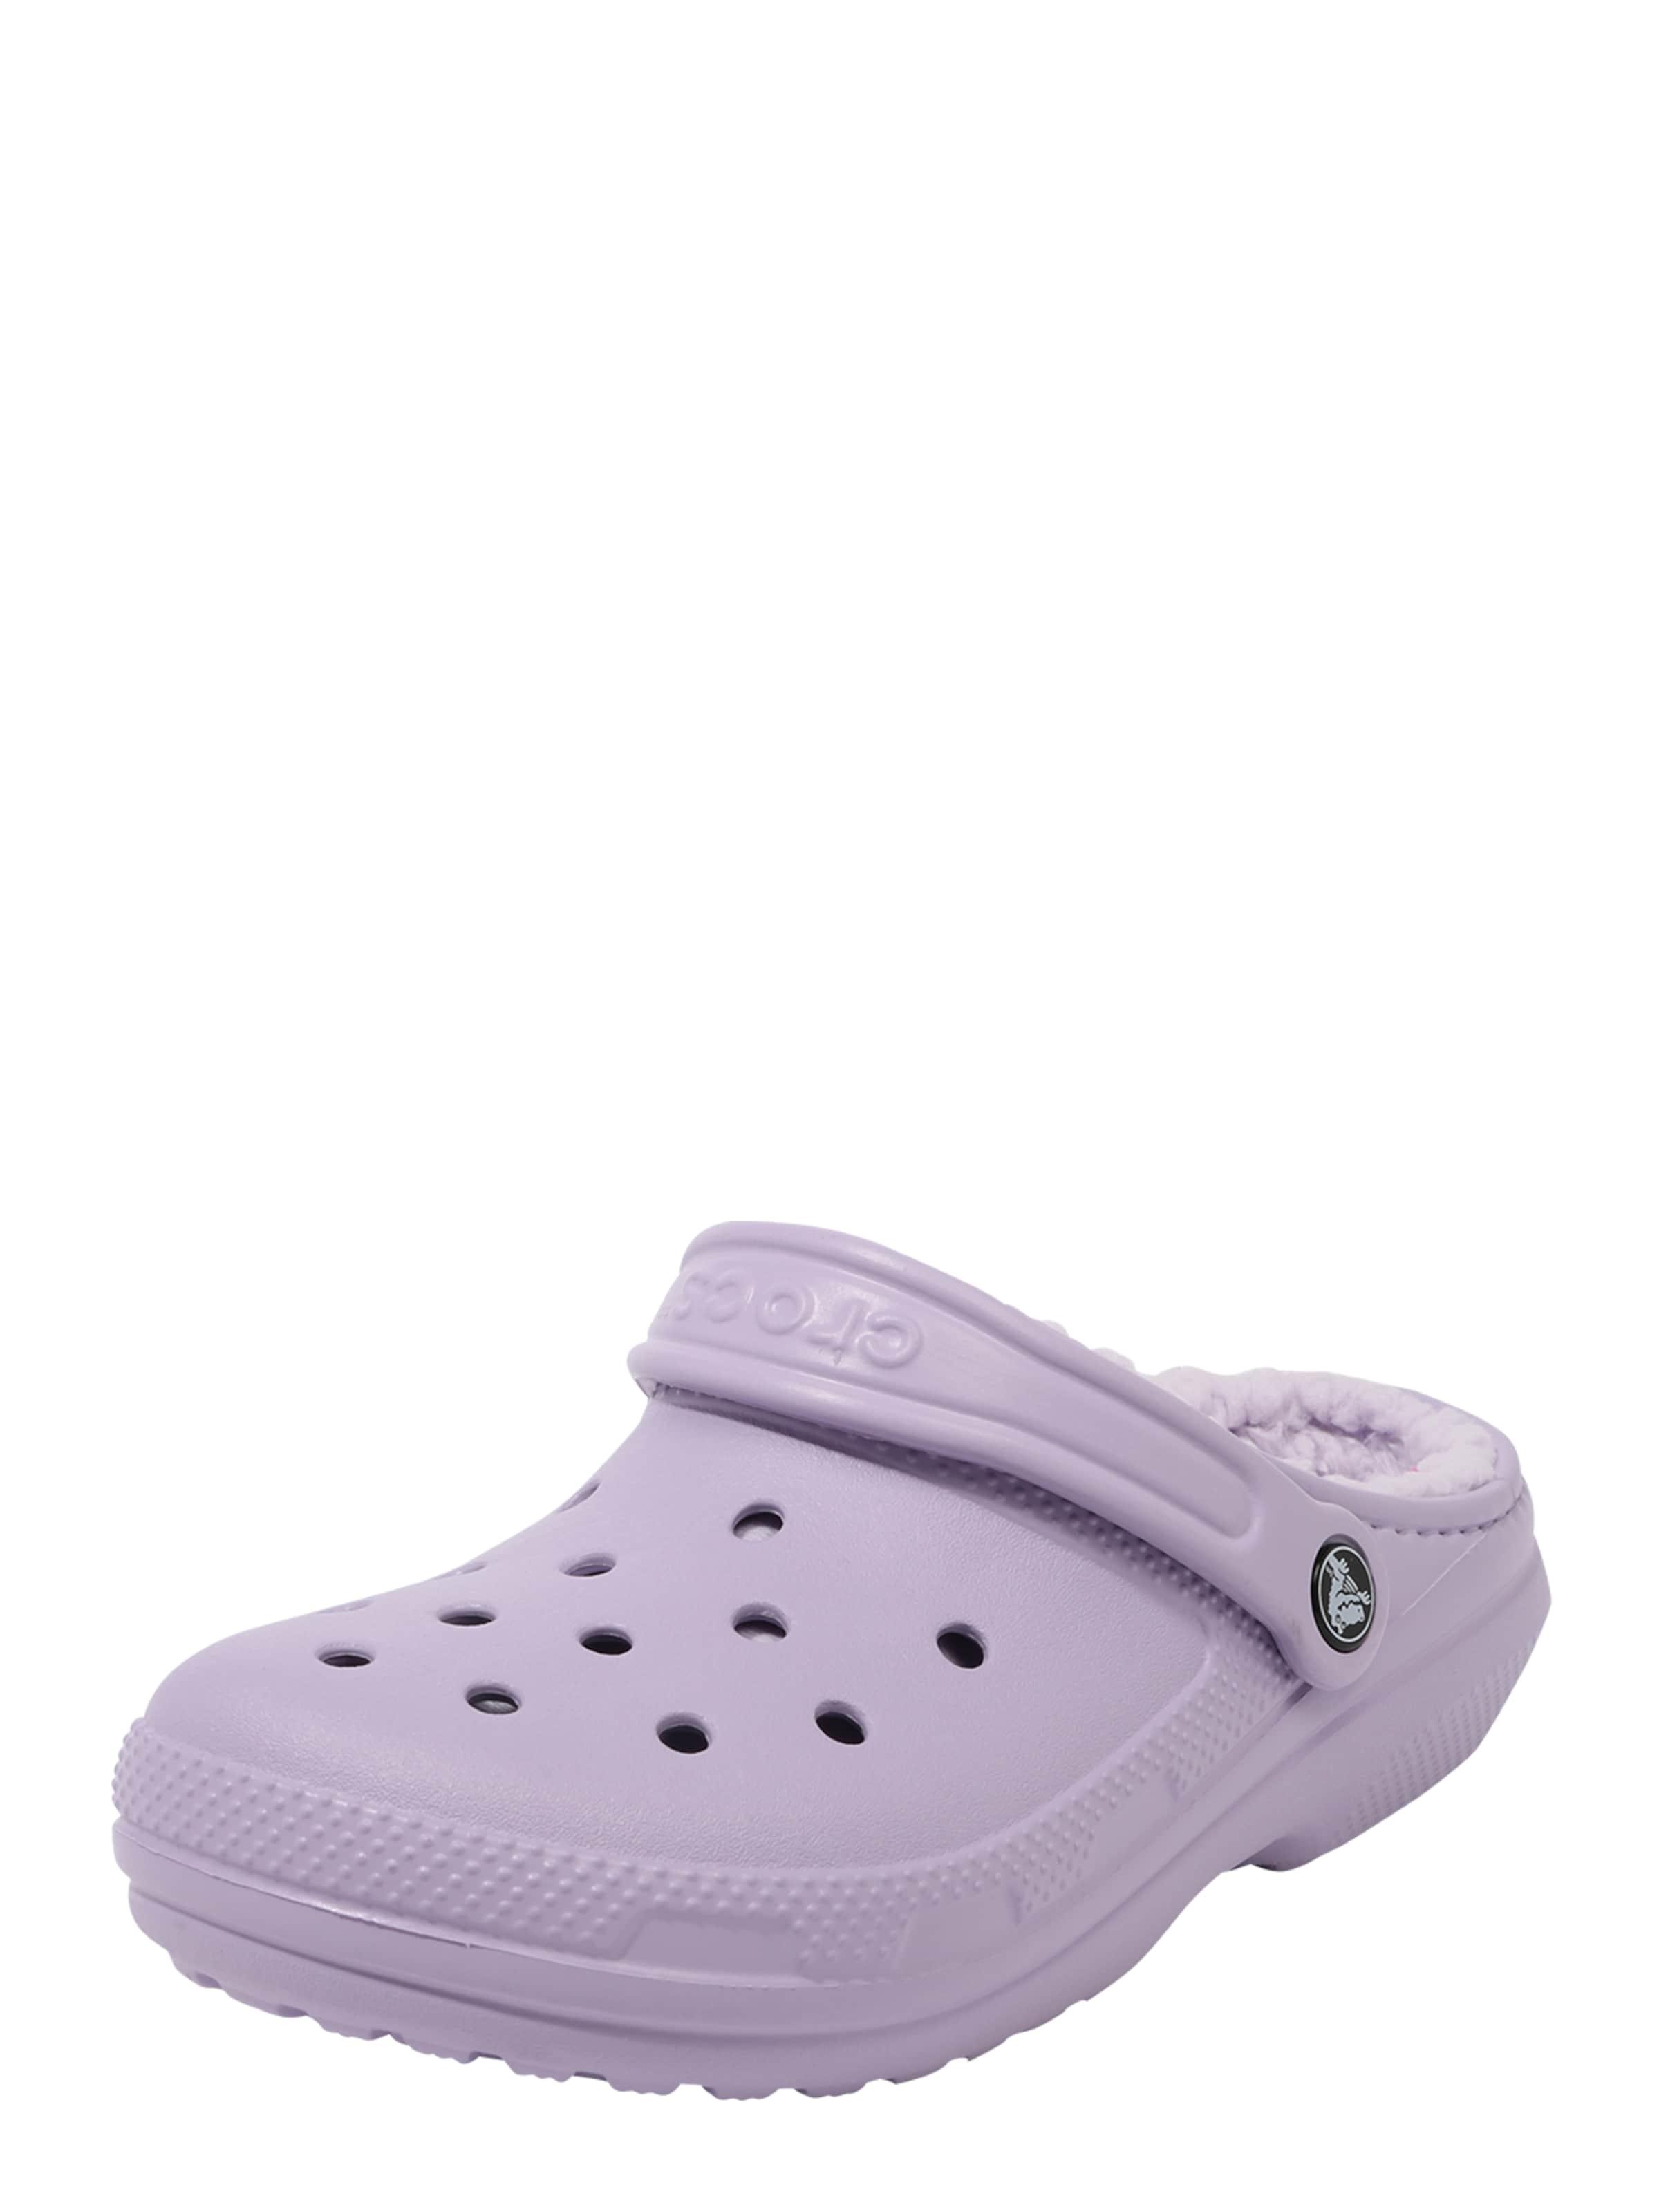 Crocs Träskor 'Classic Lined' i lavendel